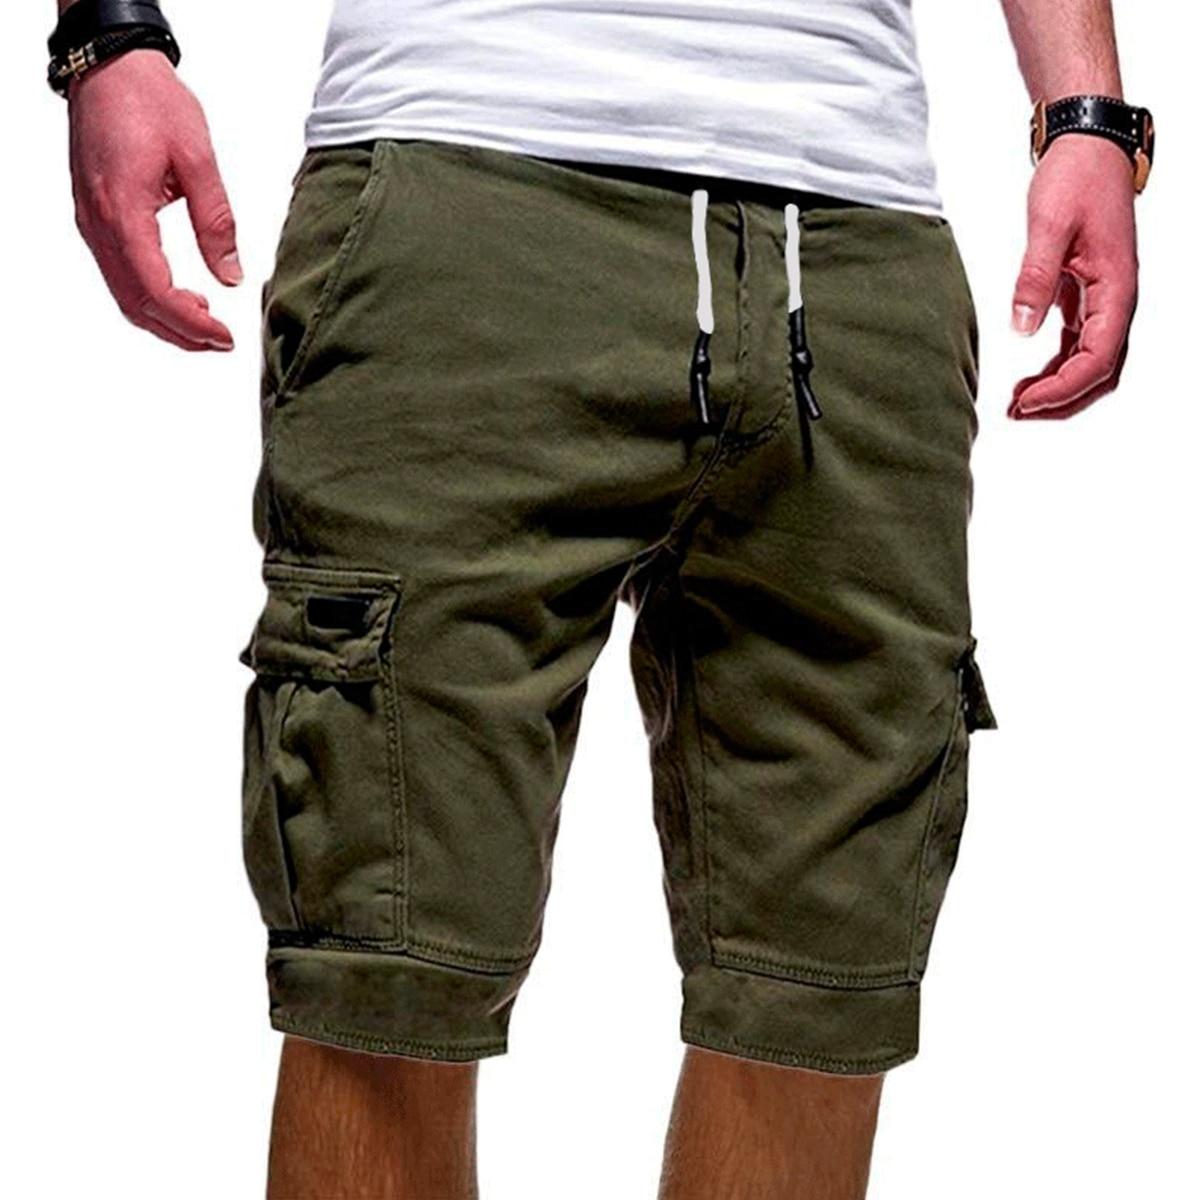 SHUJIN Hot-Selling Mens   Shorts   Fitness Casual Workout Brand Pants Quality   Shorts   Men's Multi-pocket Sports   Shorts